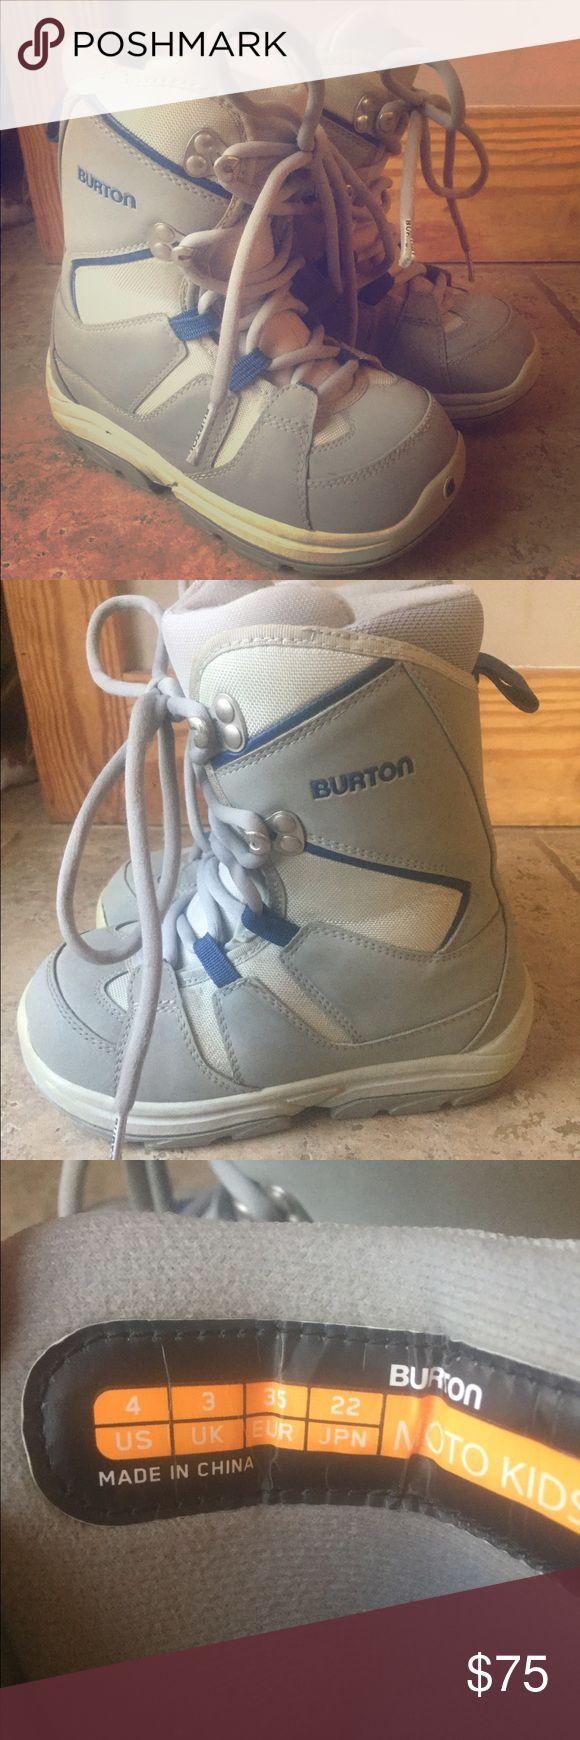 Burton Moto Kids snowboarding boot size 4 Pre owned/ lightly used kids Burton Snowboarding boots size 4 grey and navy. Sweet! Burton Shoes Boots